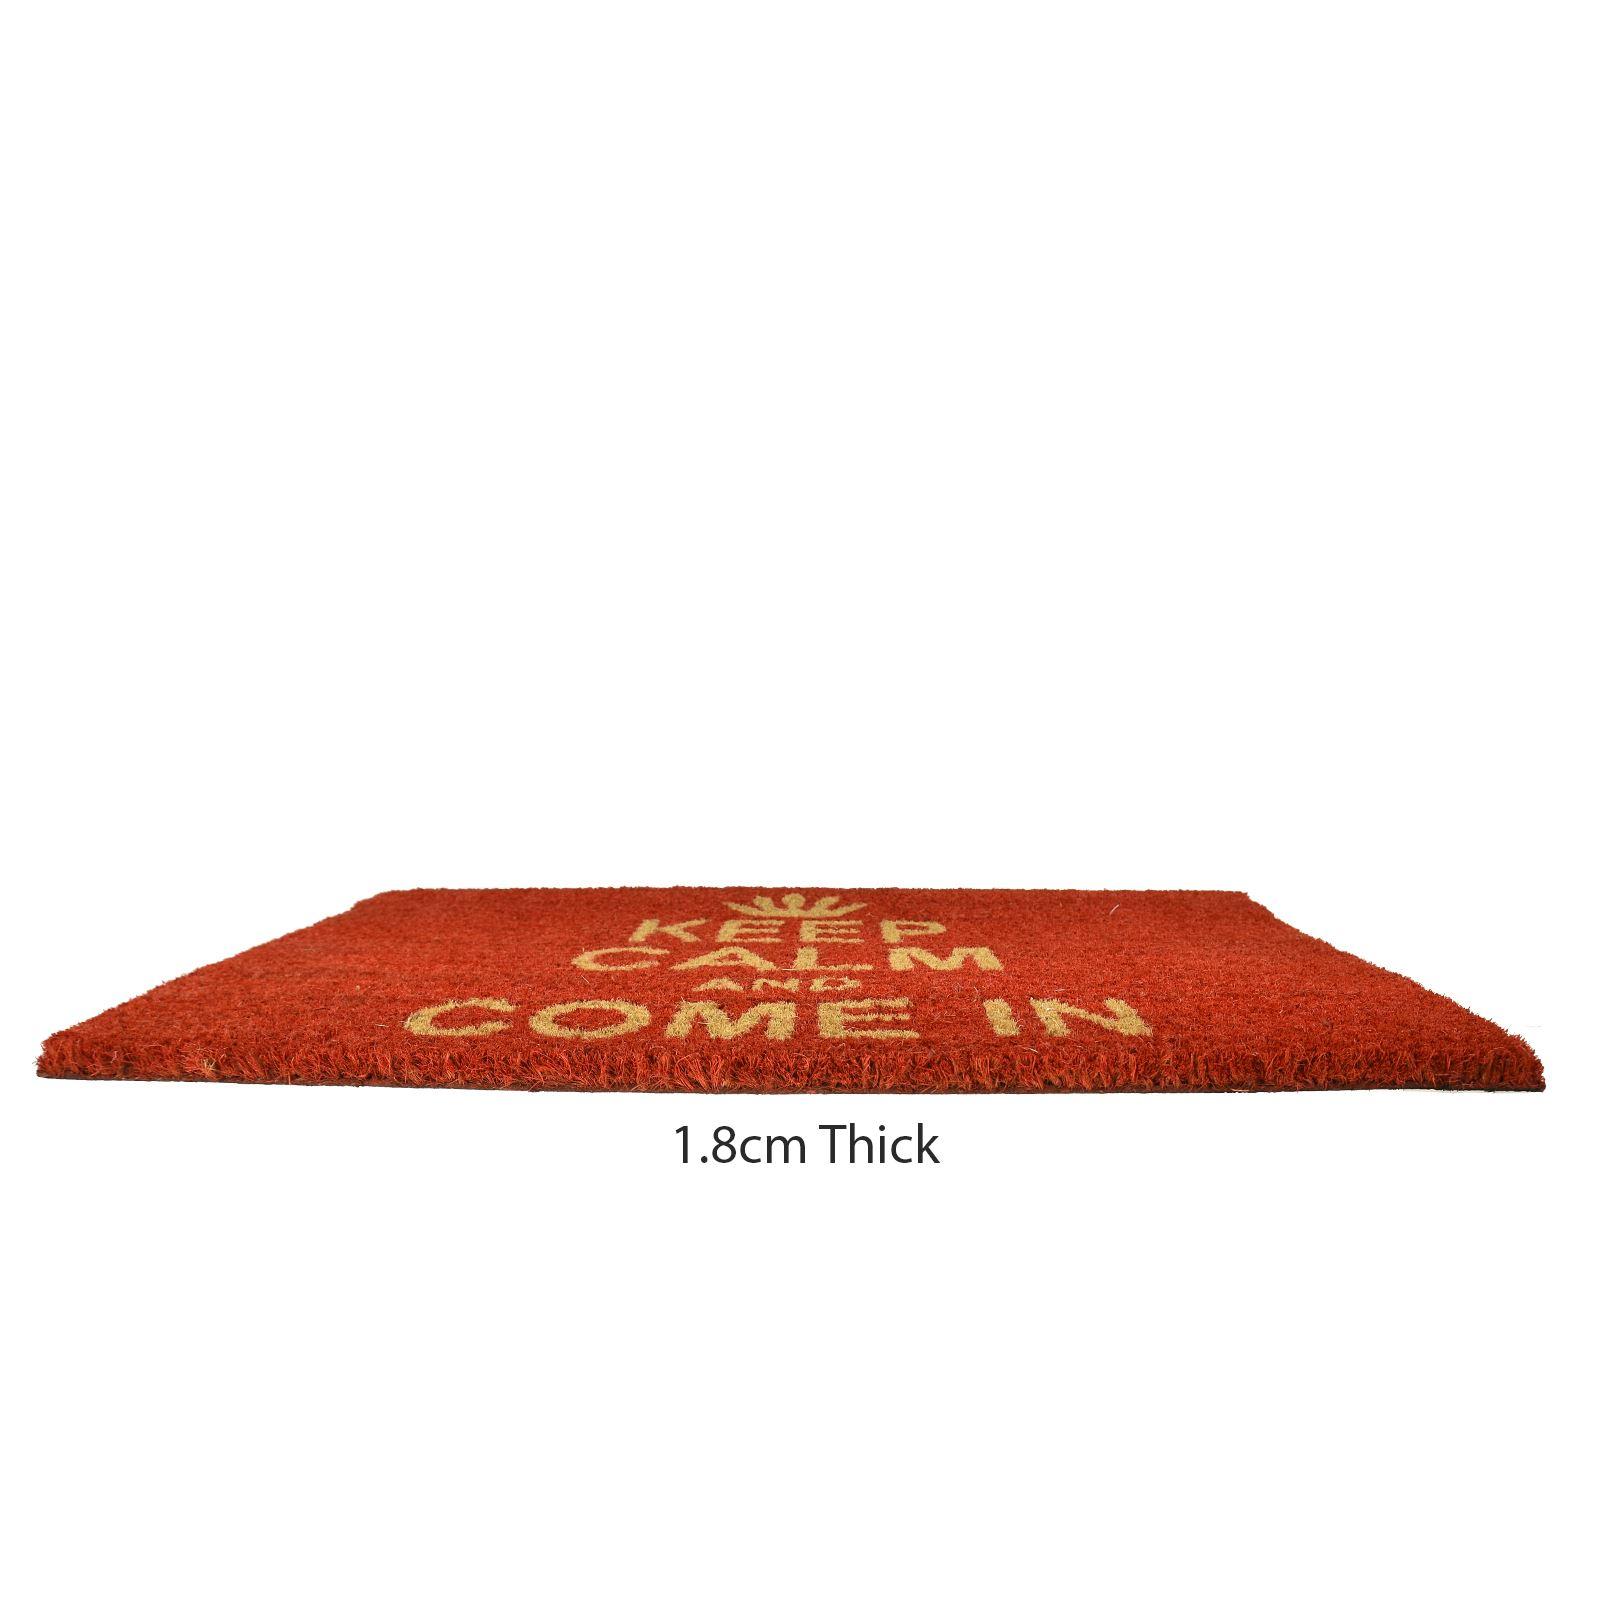 Plain-Non-Slip-Door-Mat-Tough-Natural-Coir-PVC-Back-Welcome-Doormat-40-x-60cm miniatura 82